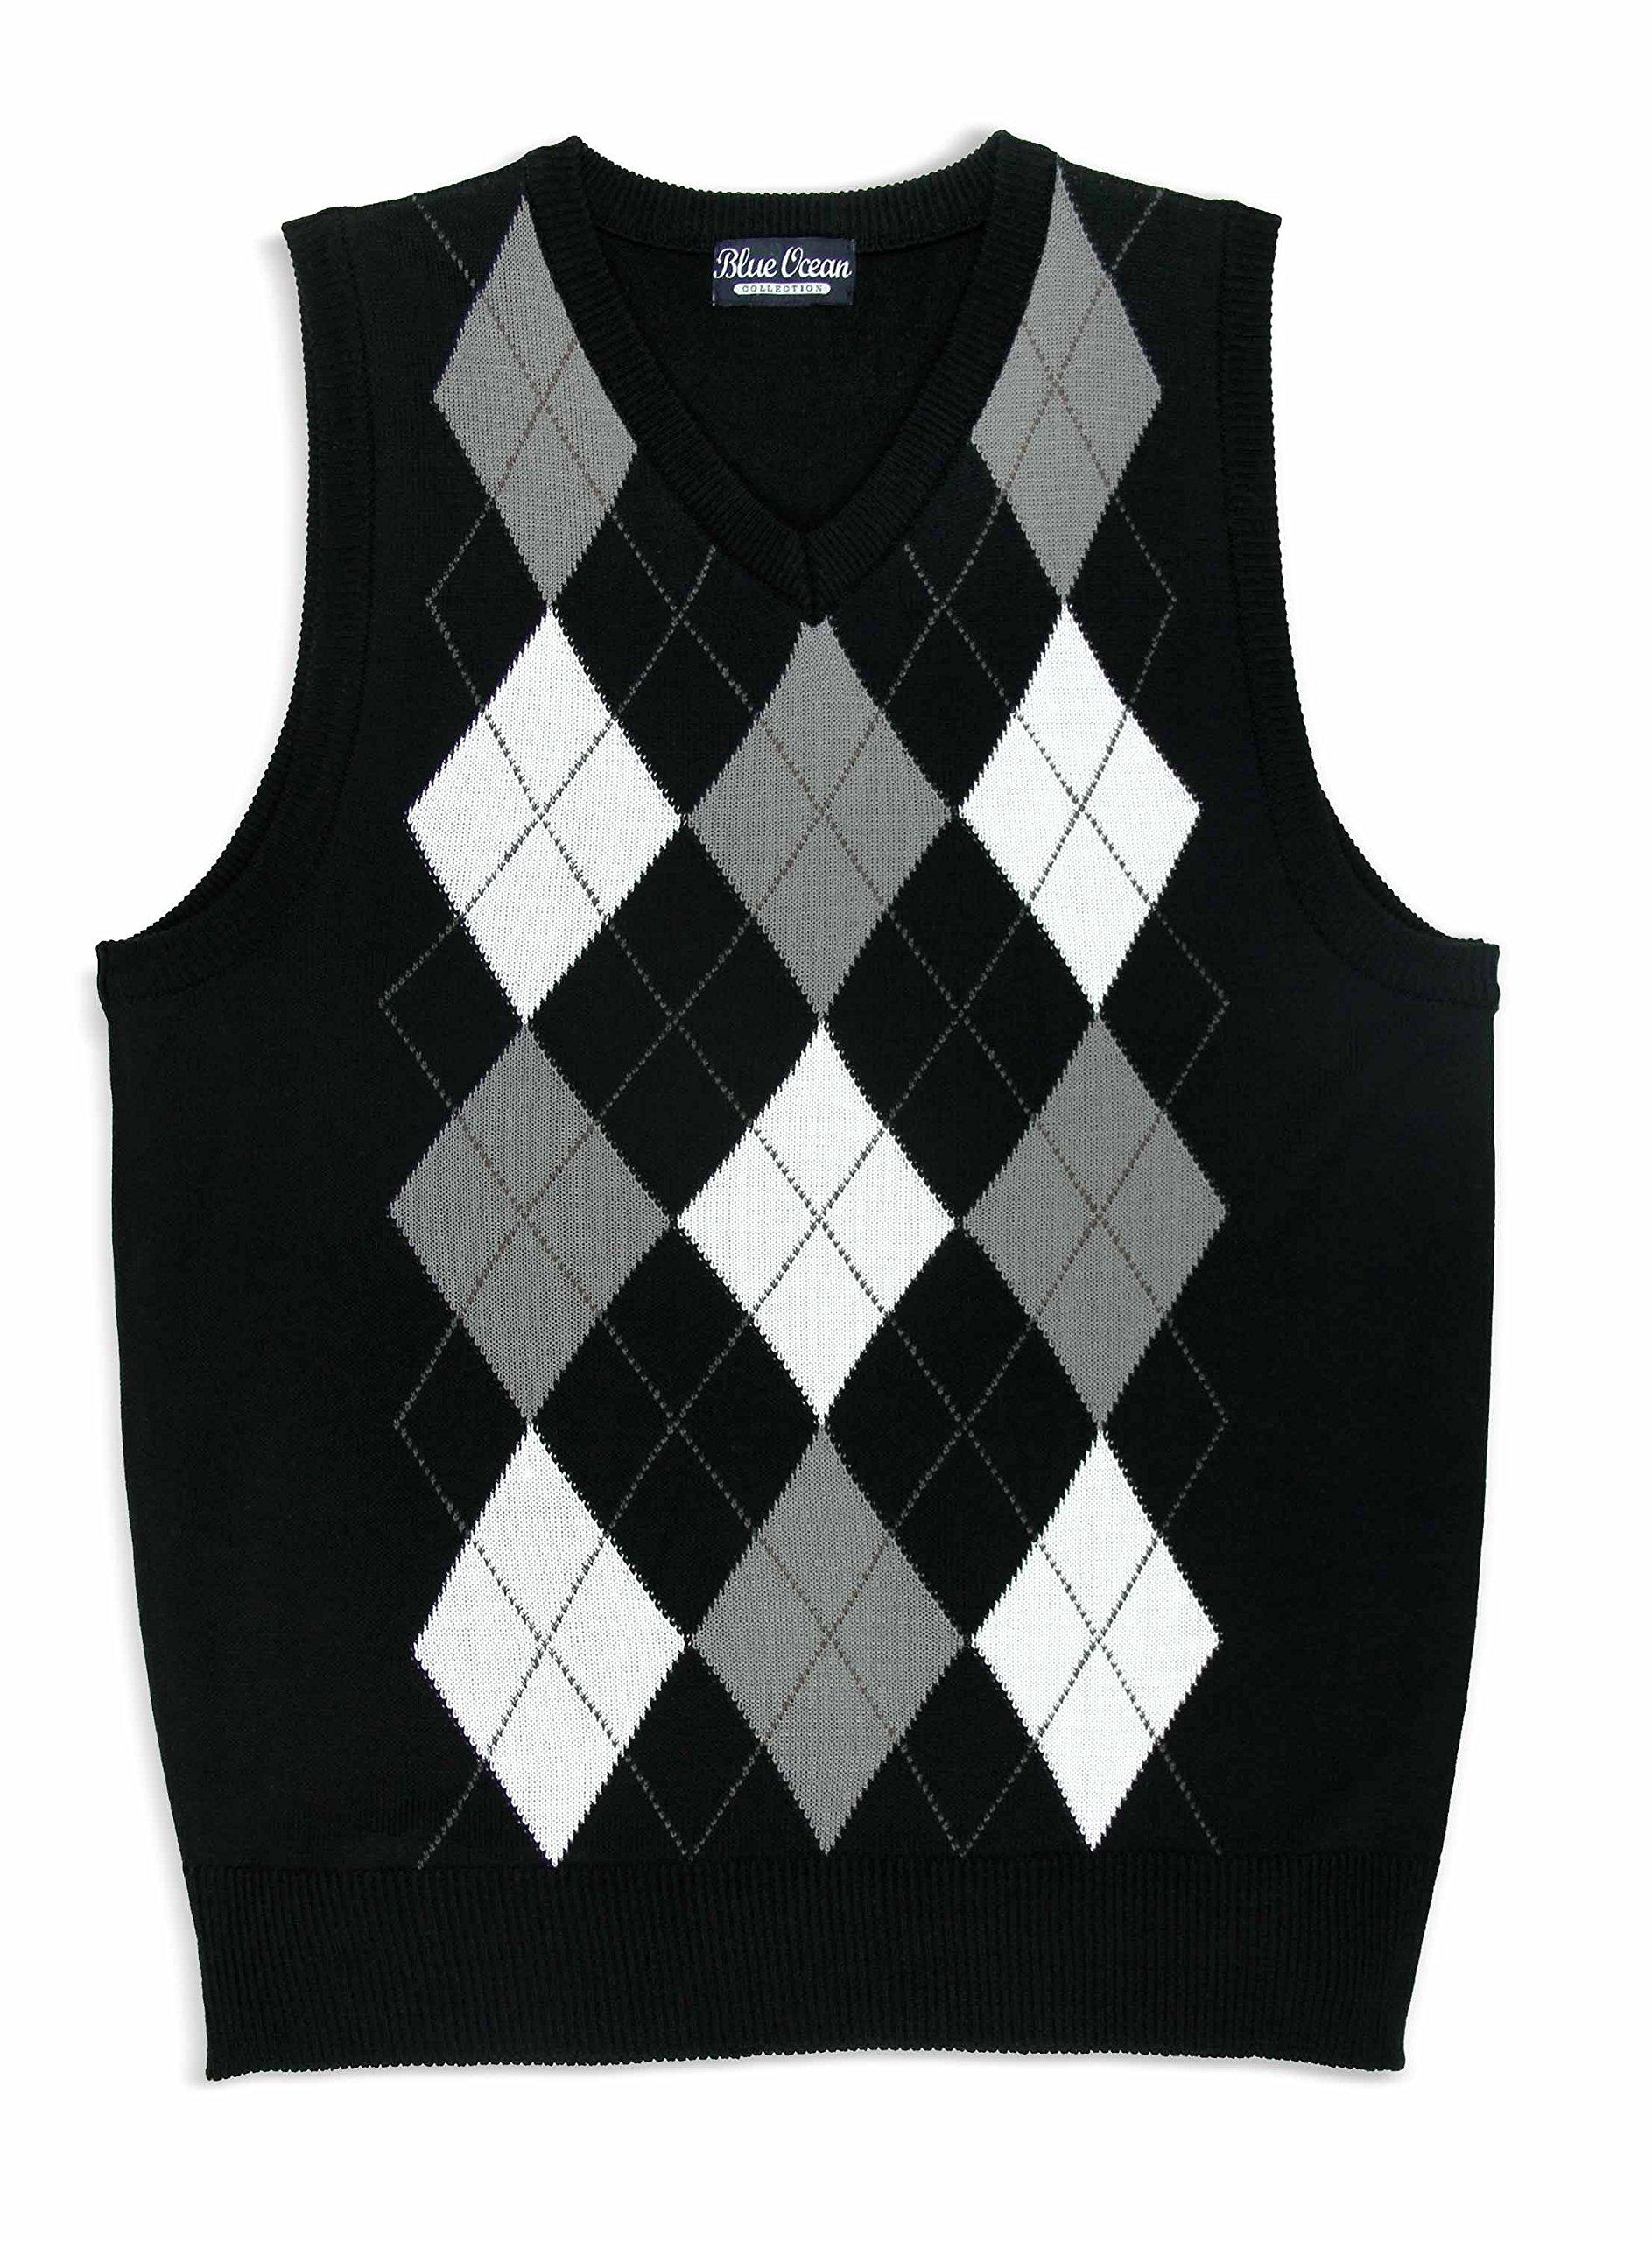 Blue Ocean Kids Argyle Sweater Vest-8-10/Small